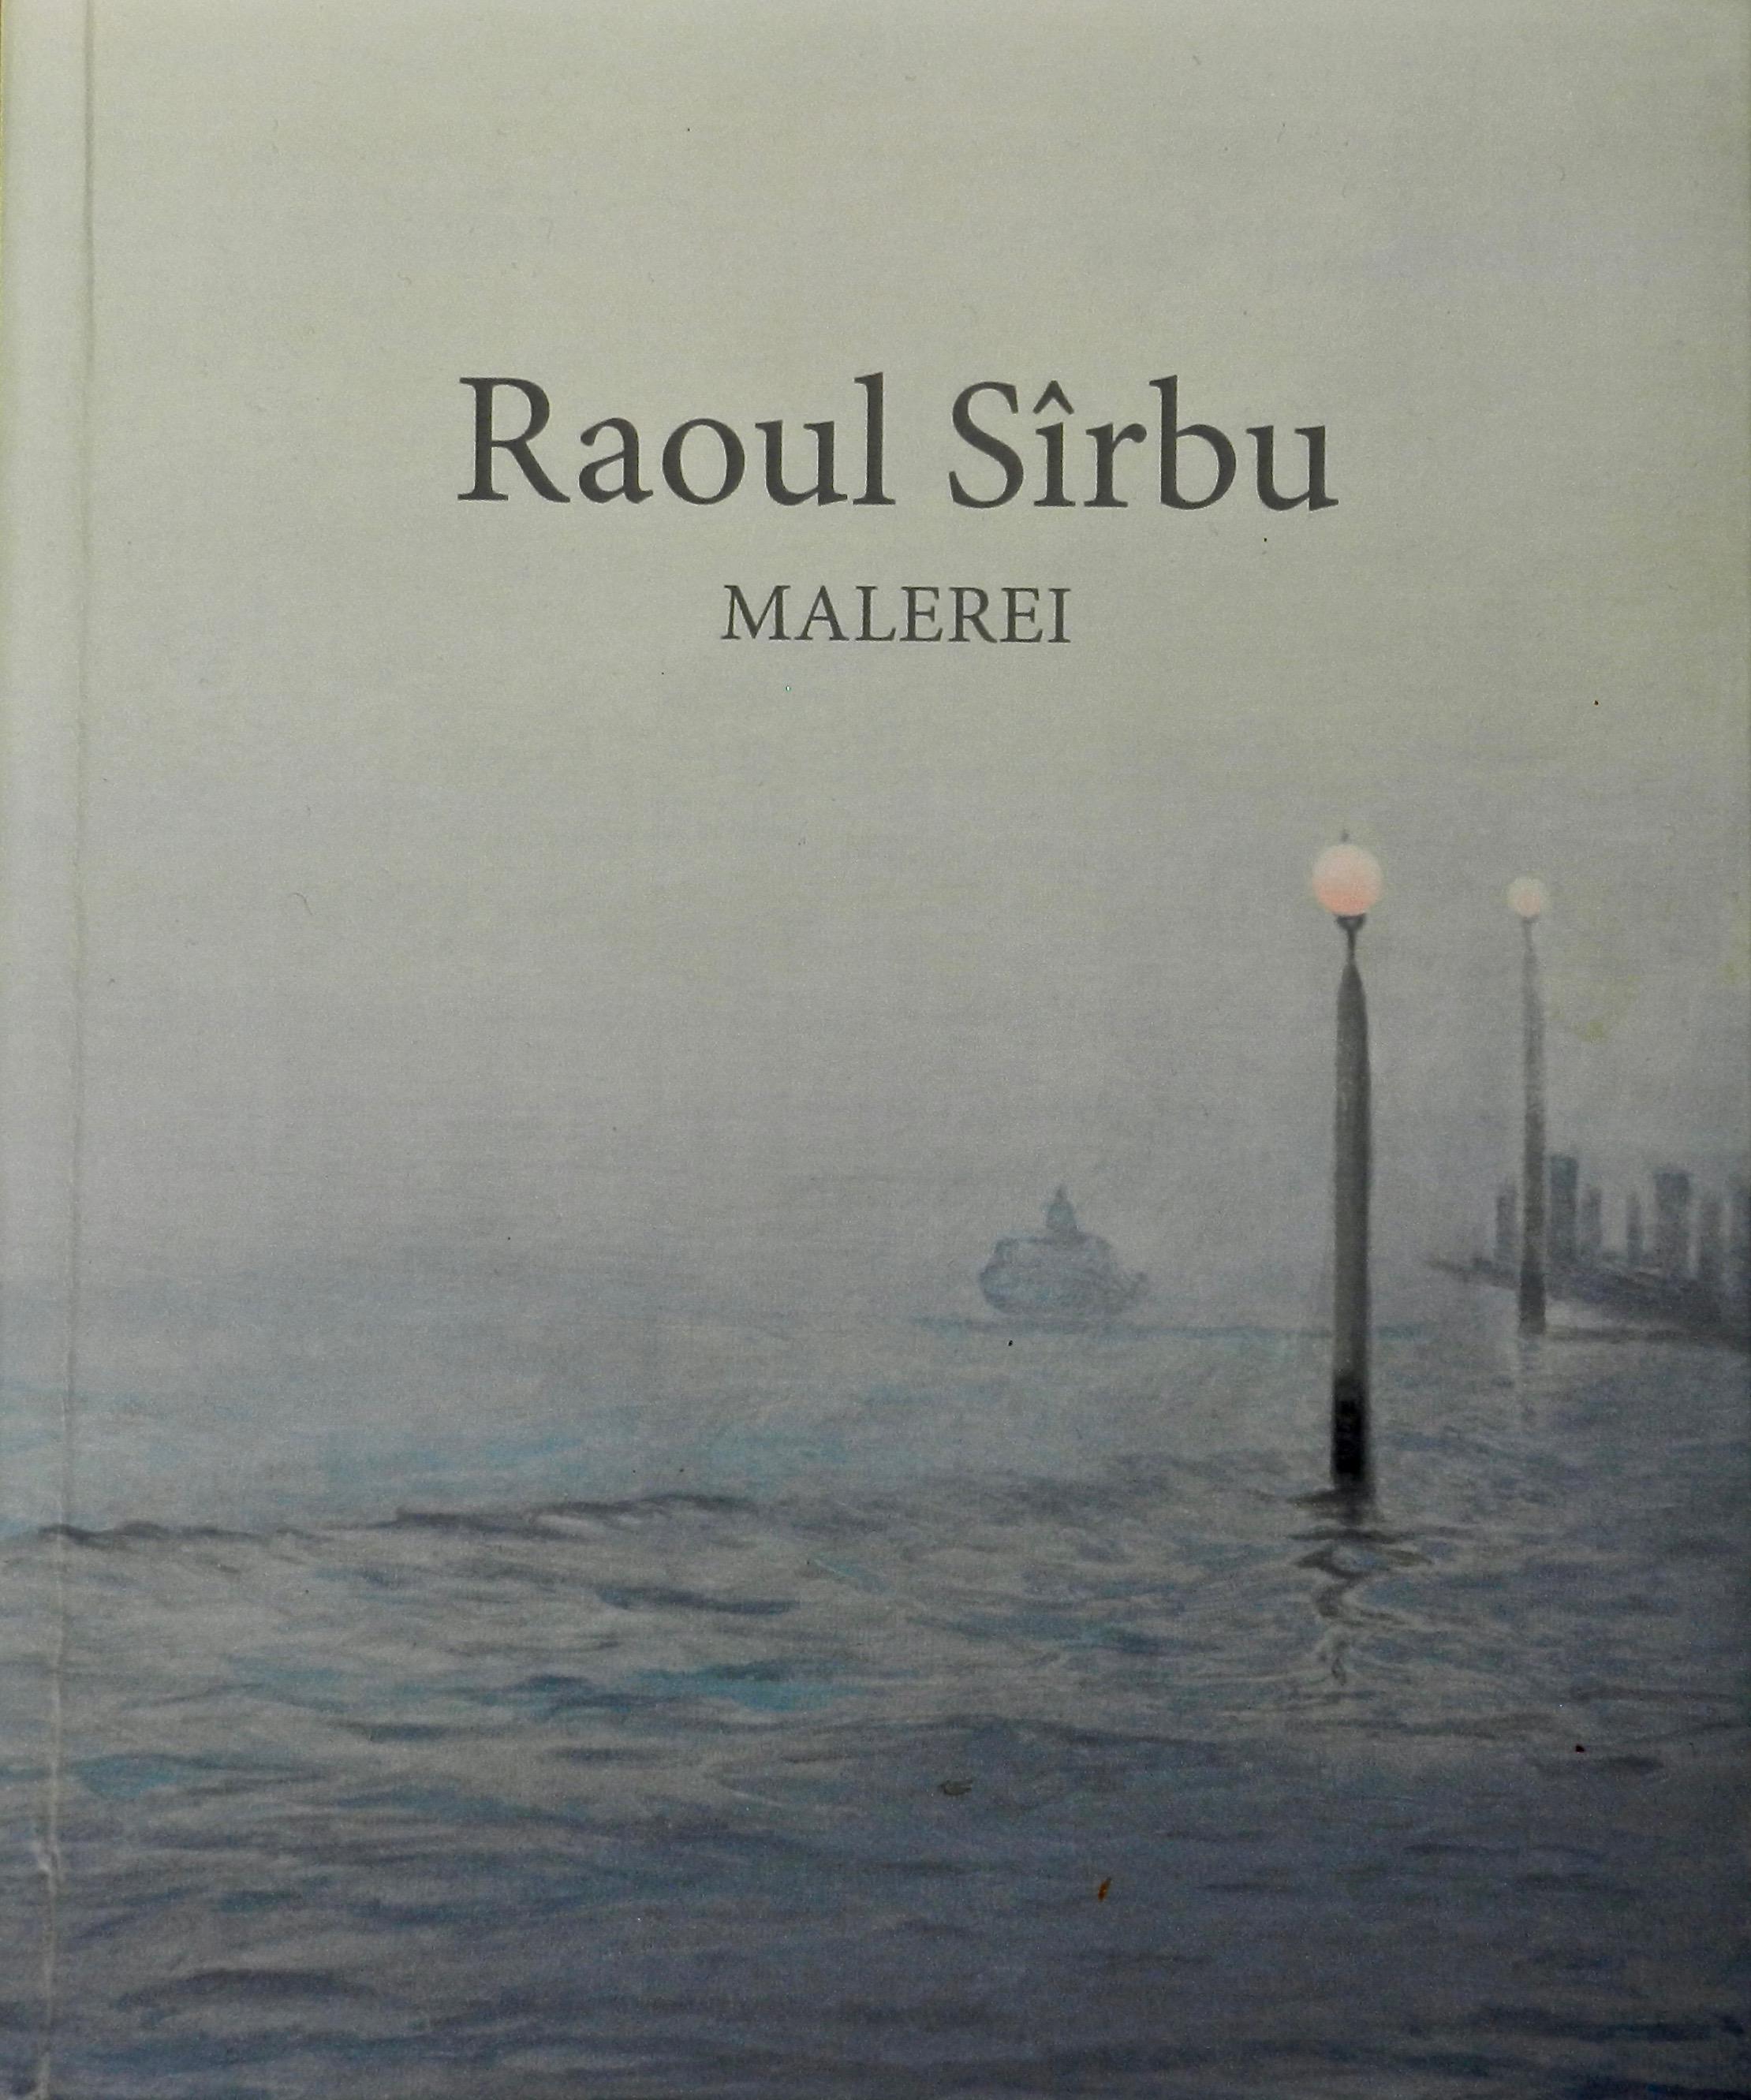 Raoul Sîrbu - Malerei